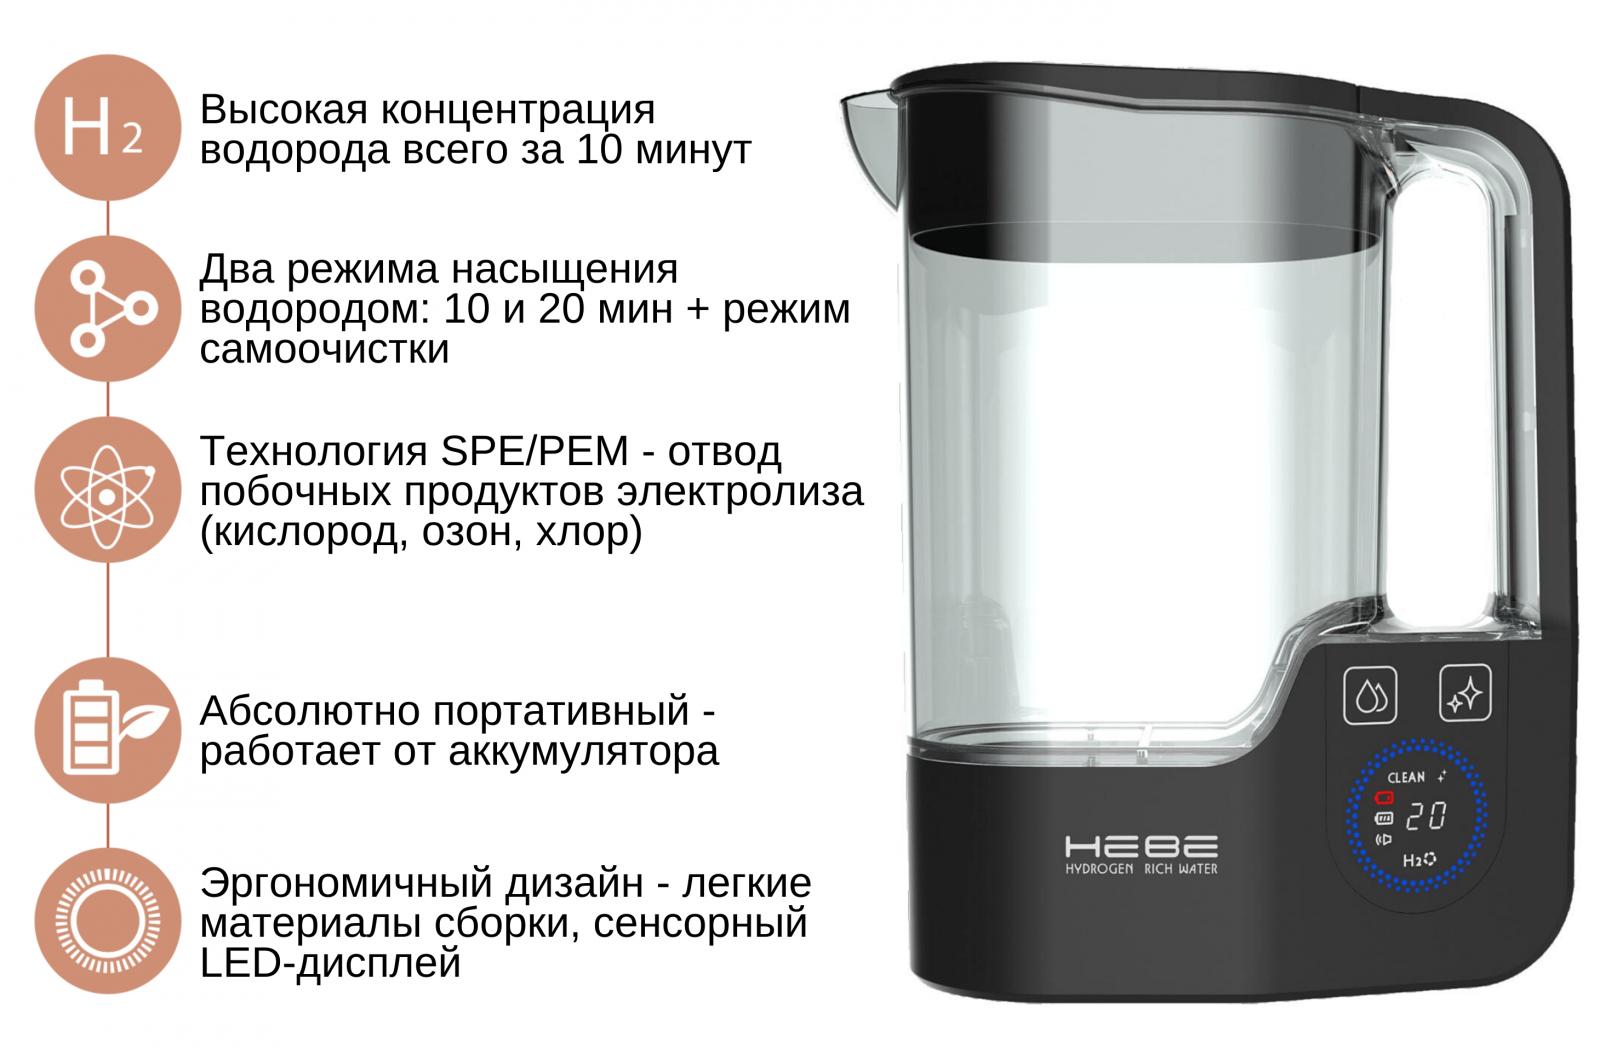 водородный кувшин корея